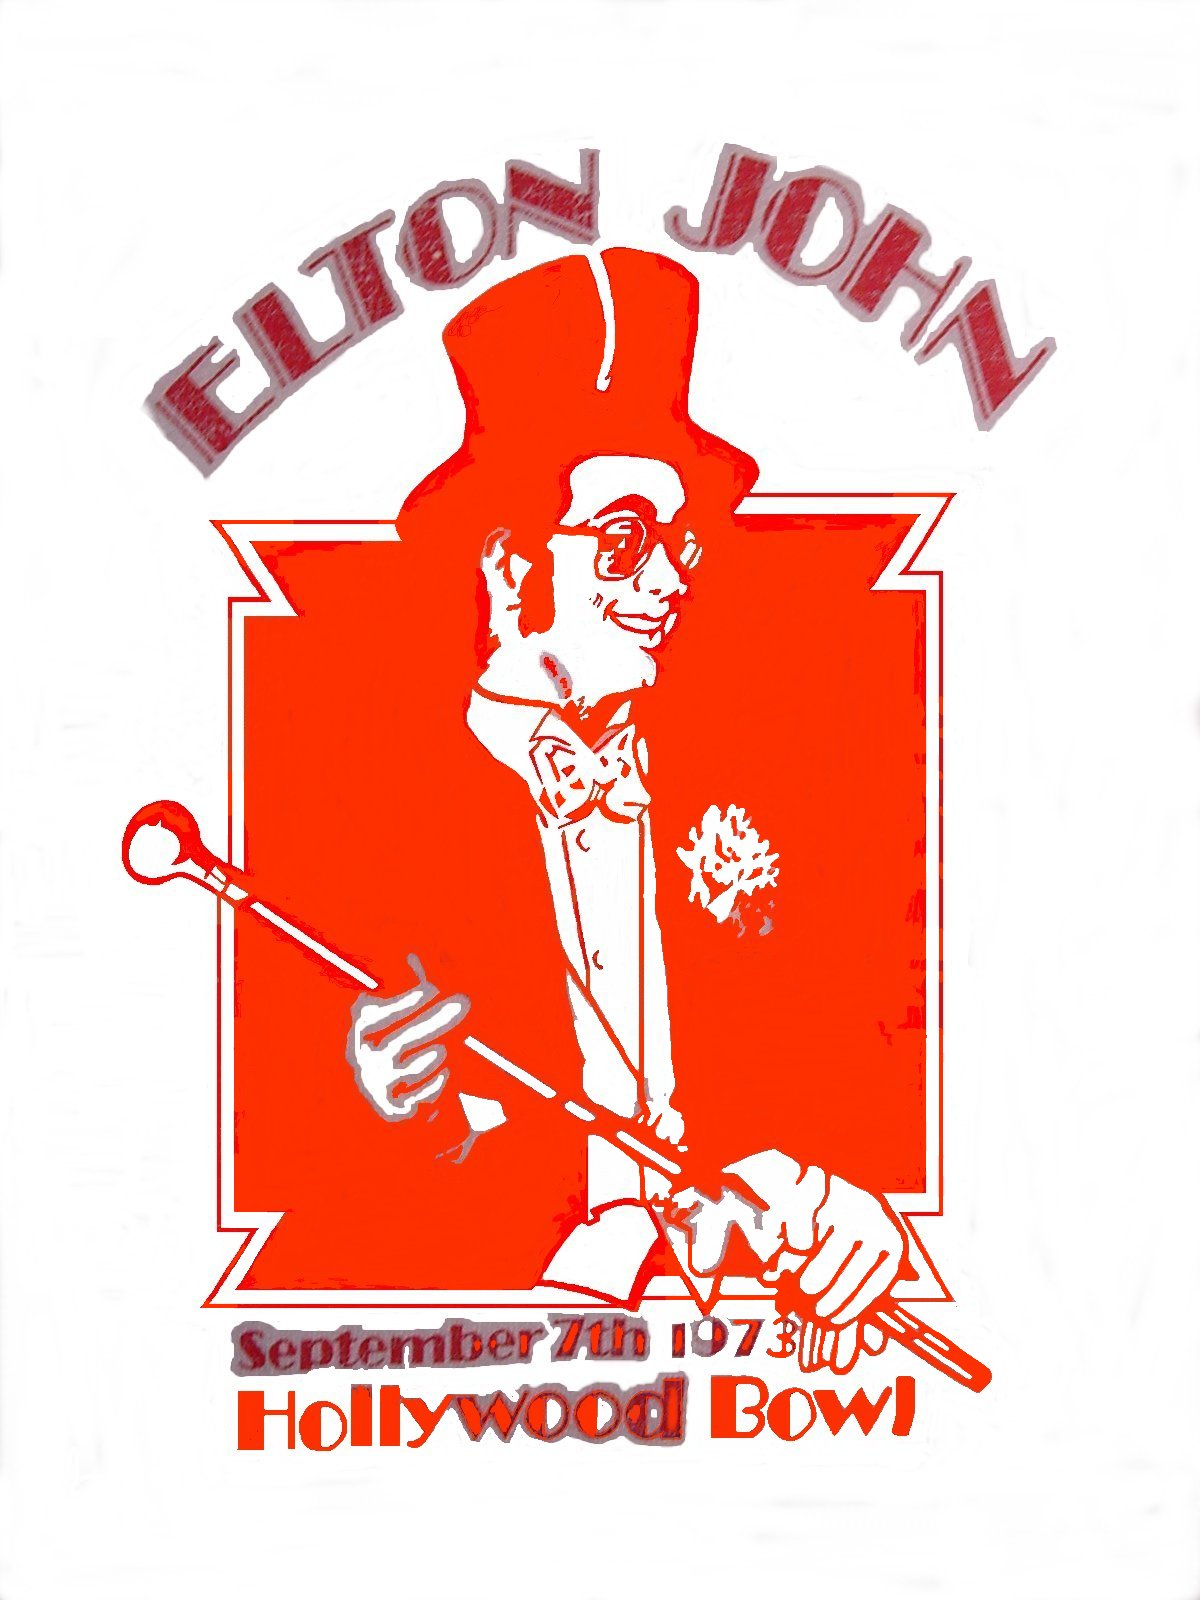 Classic Elton John 1973 Tshirt Image, Undergoing